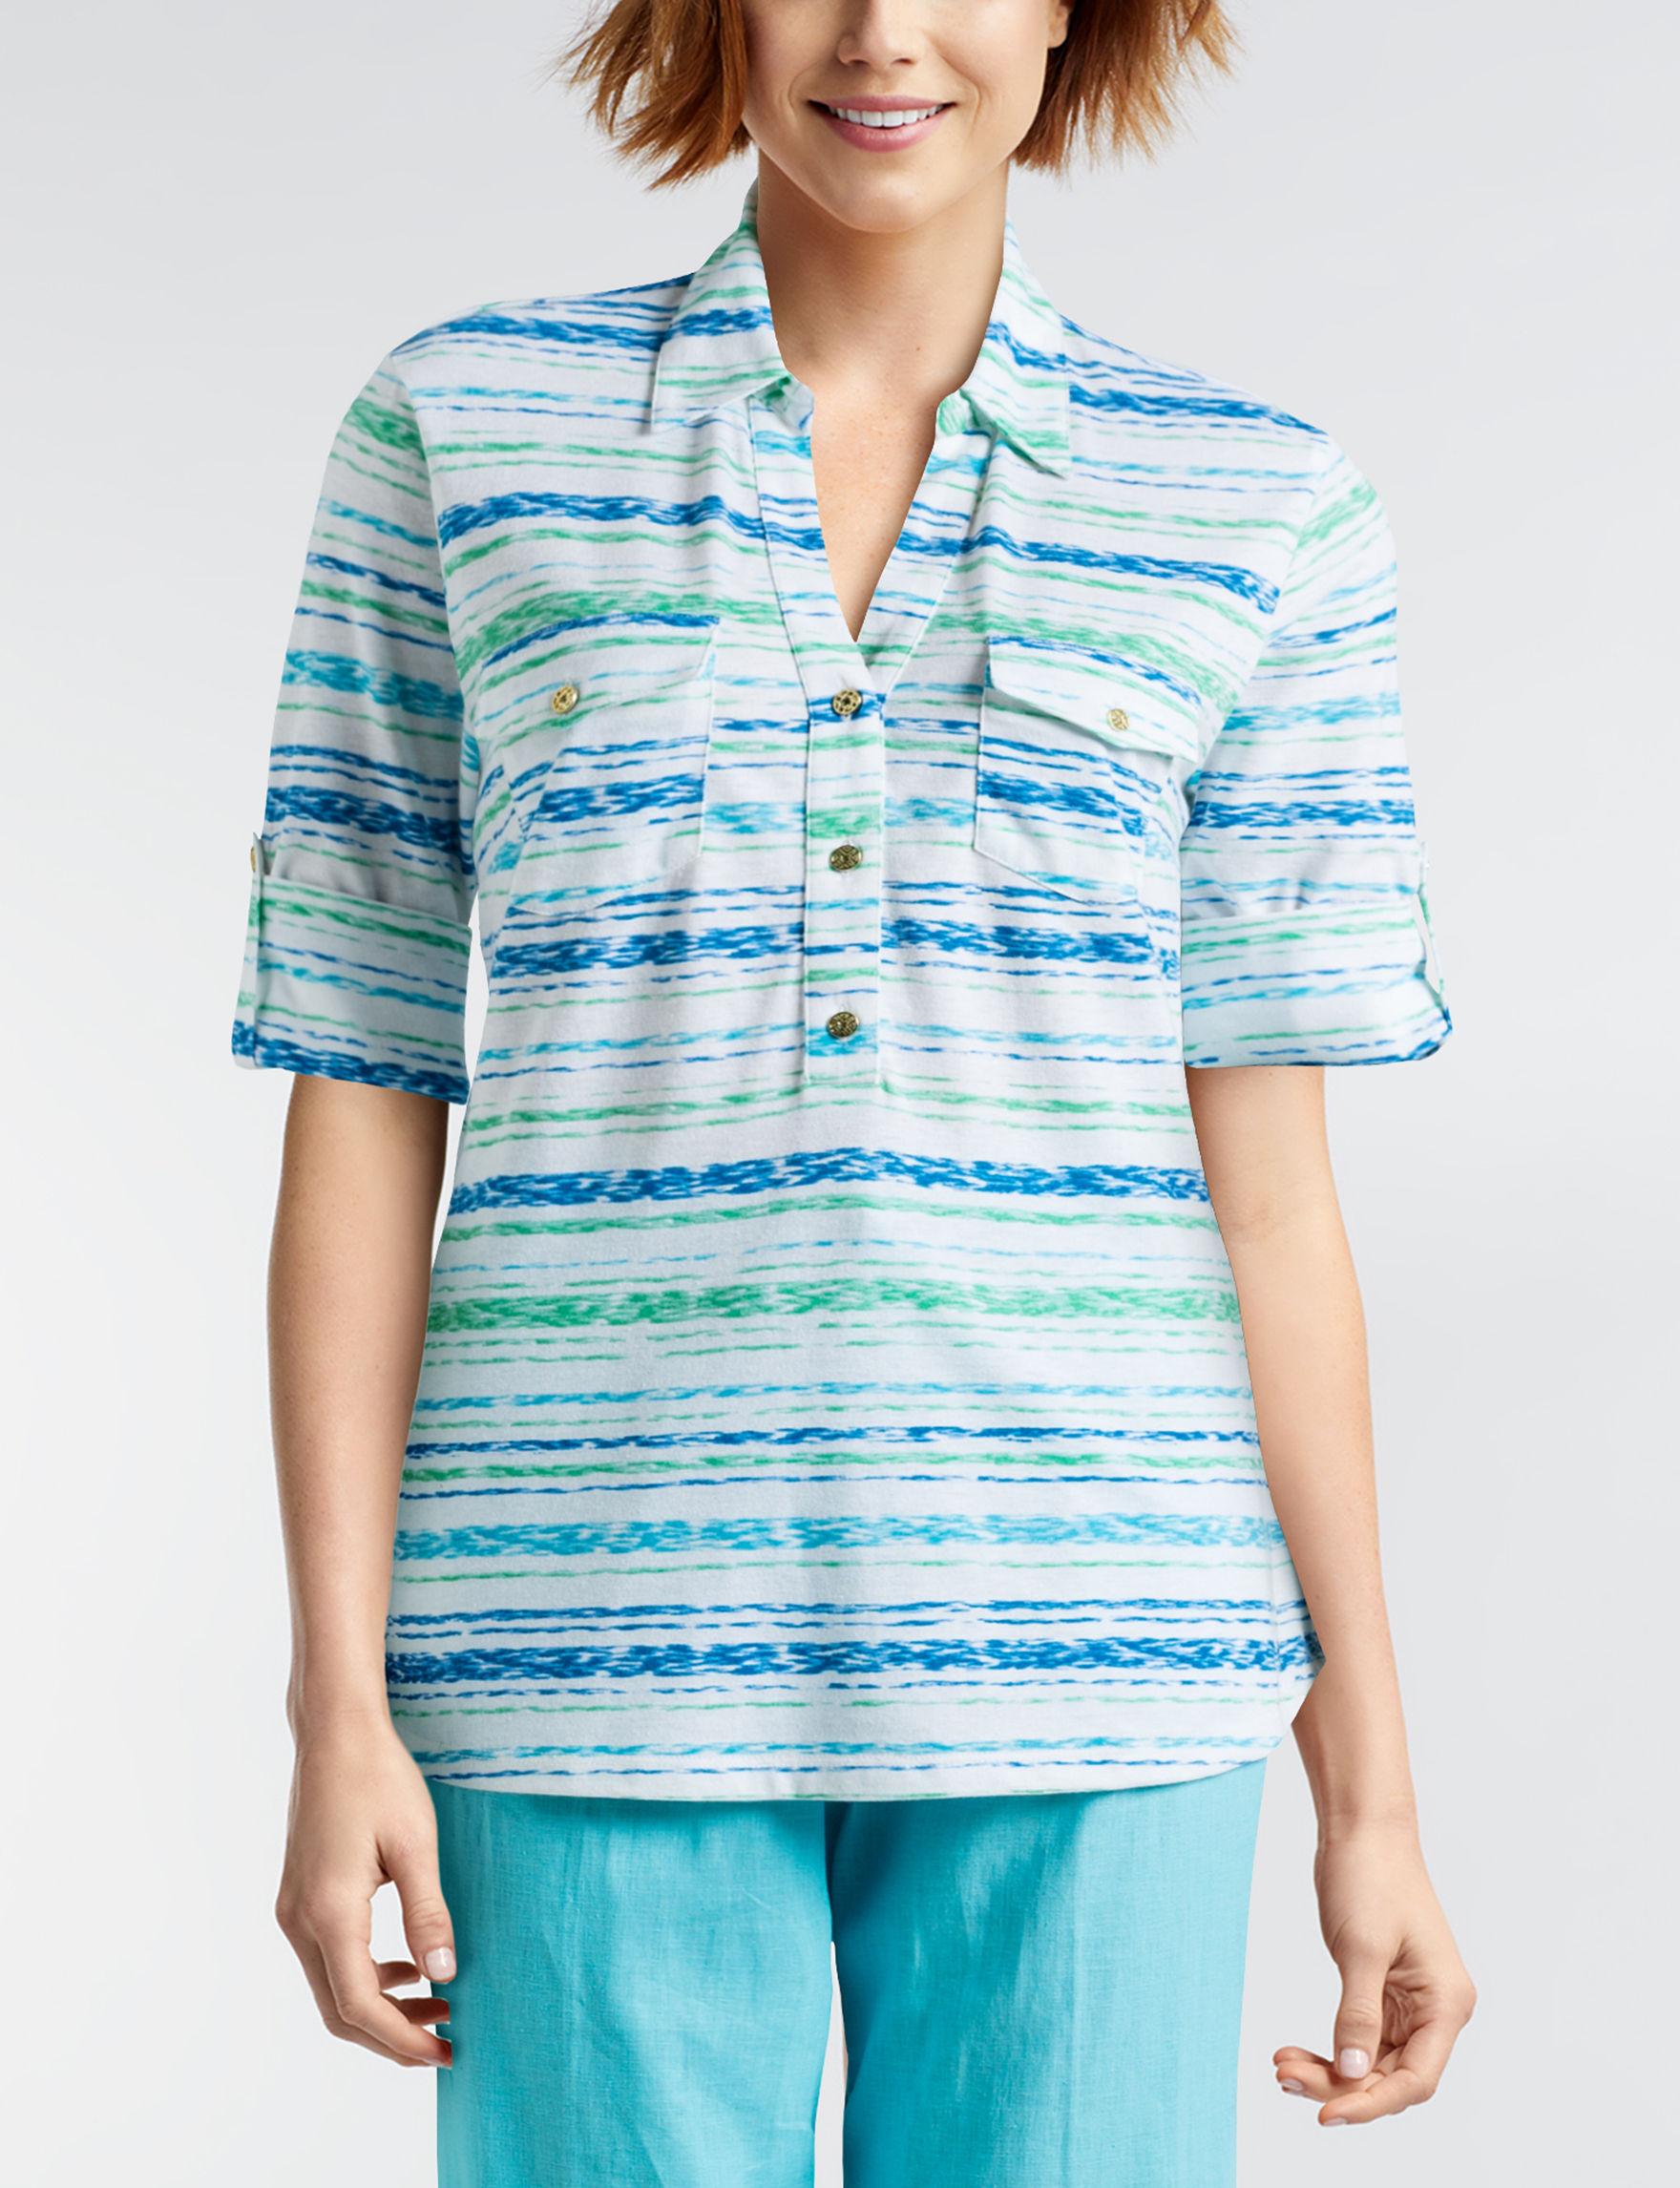 Rebecca Malone Bermuda Shirts & Blouses